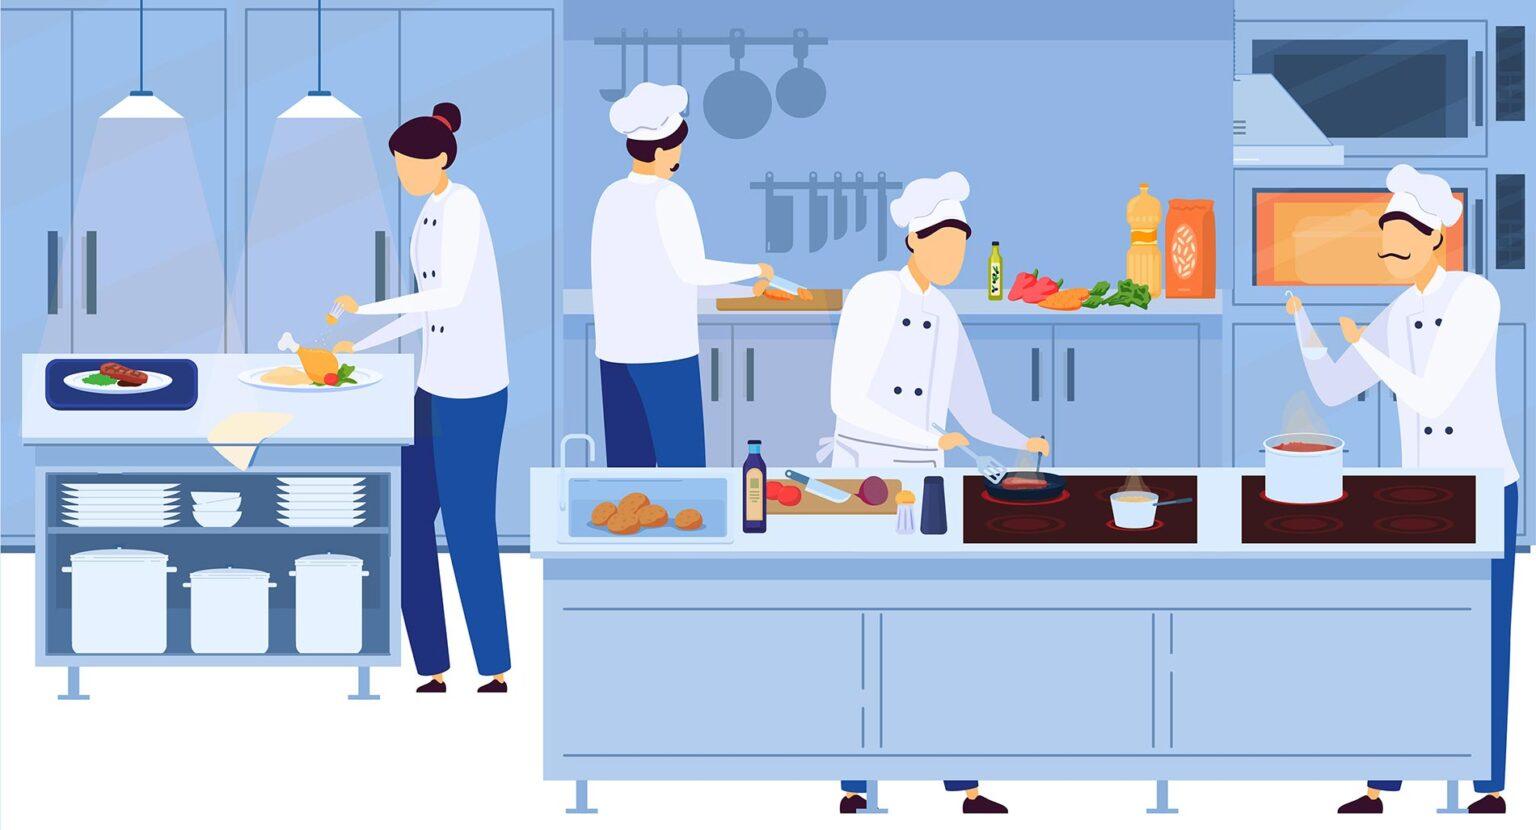 Cloud kitchen or ghost restaurant model